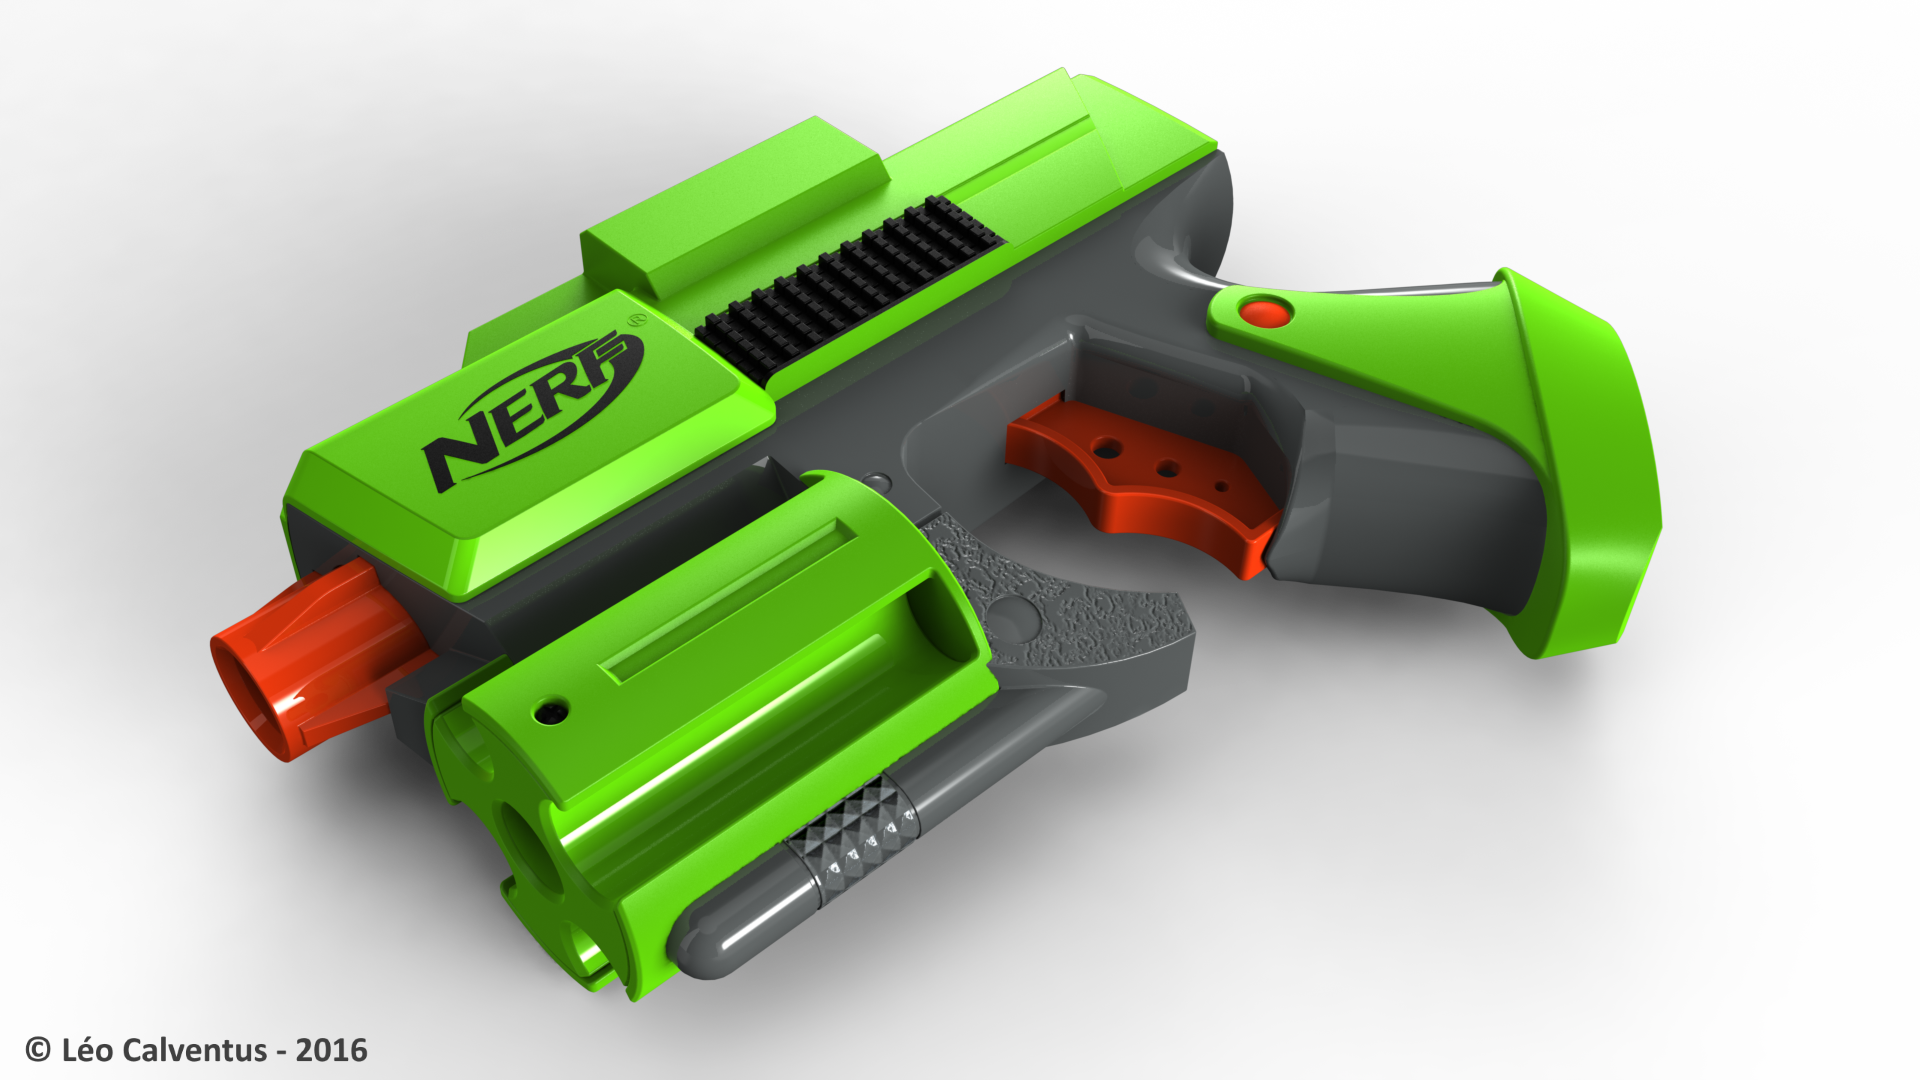 NERF Dart Tag Green Handgun by Jetstorm-477